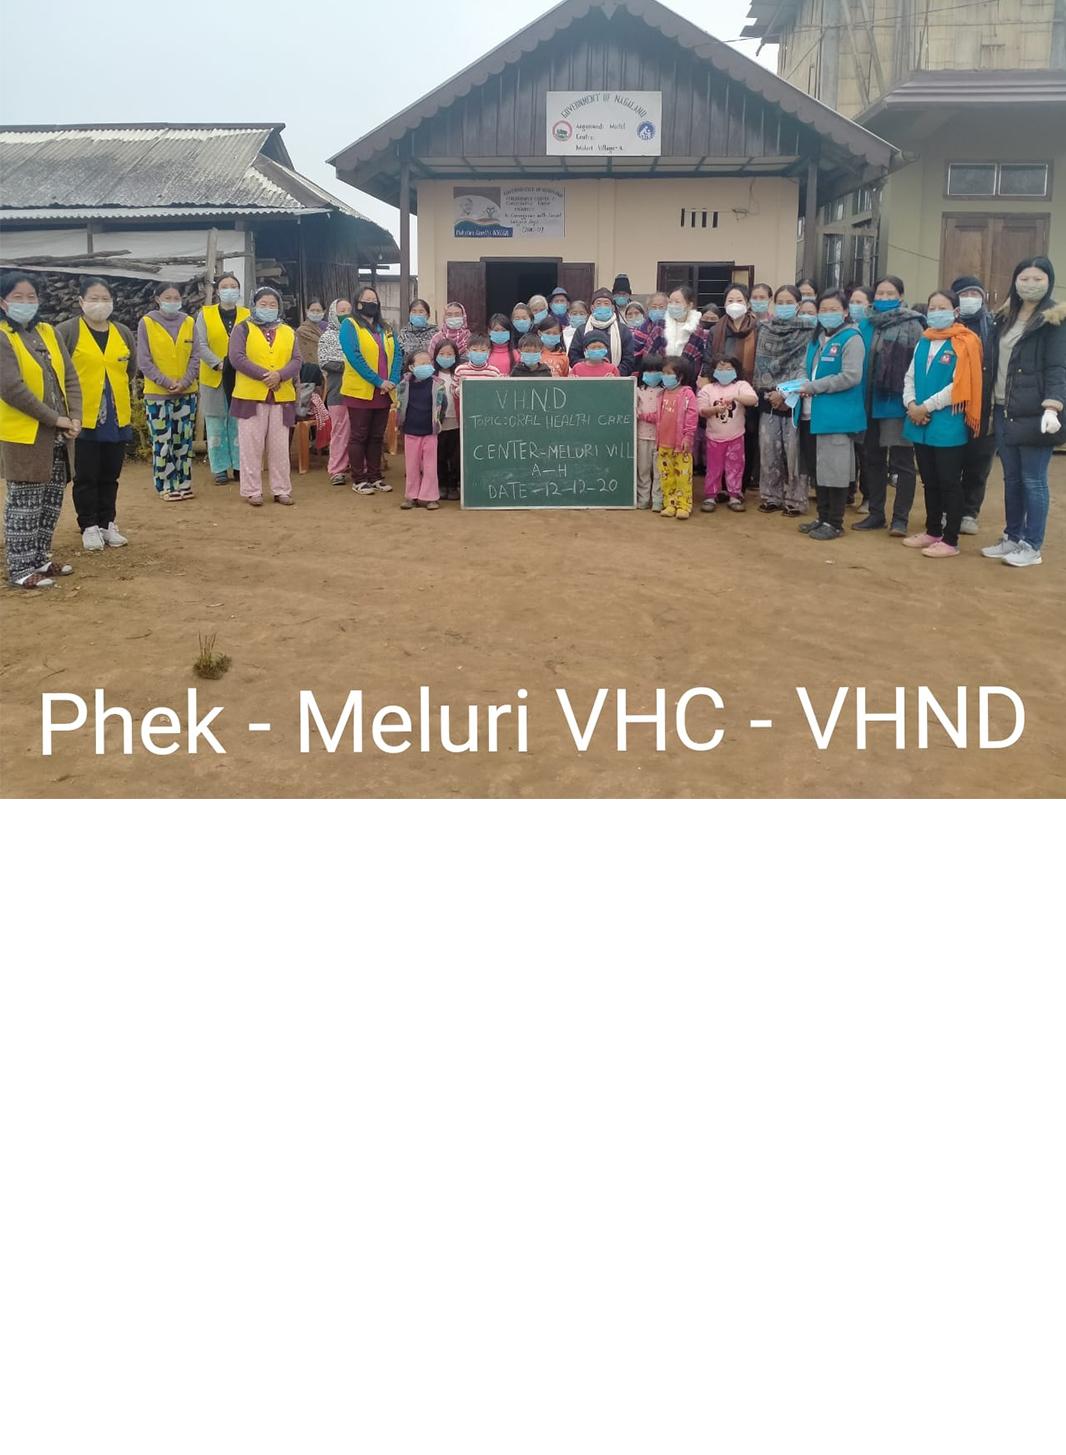 Phek-Meluri-VHC-VHND